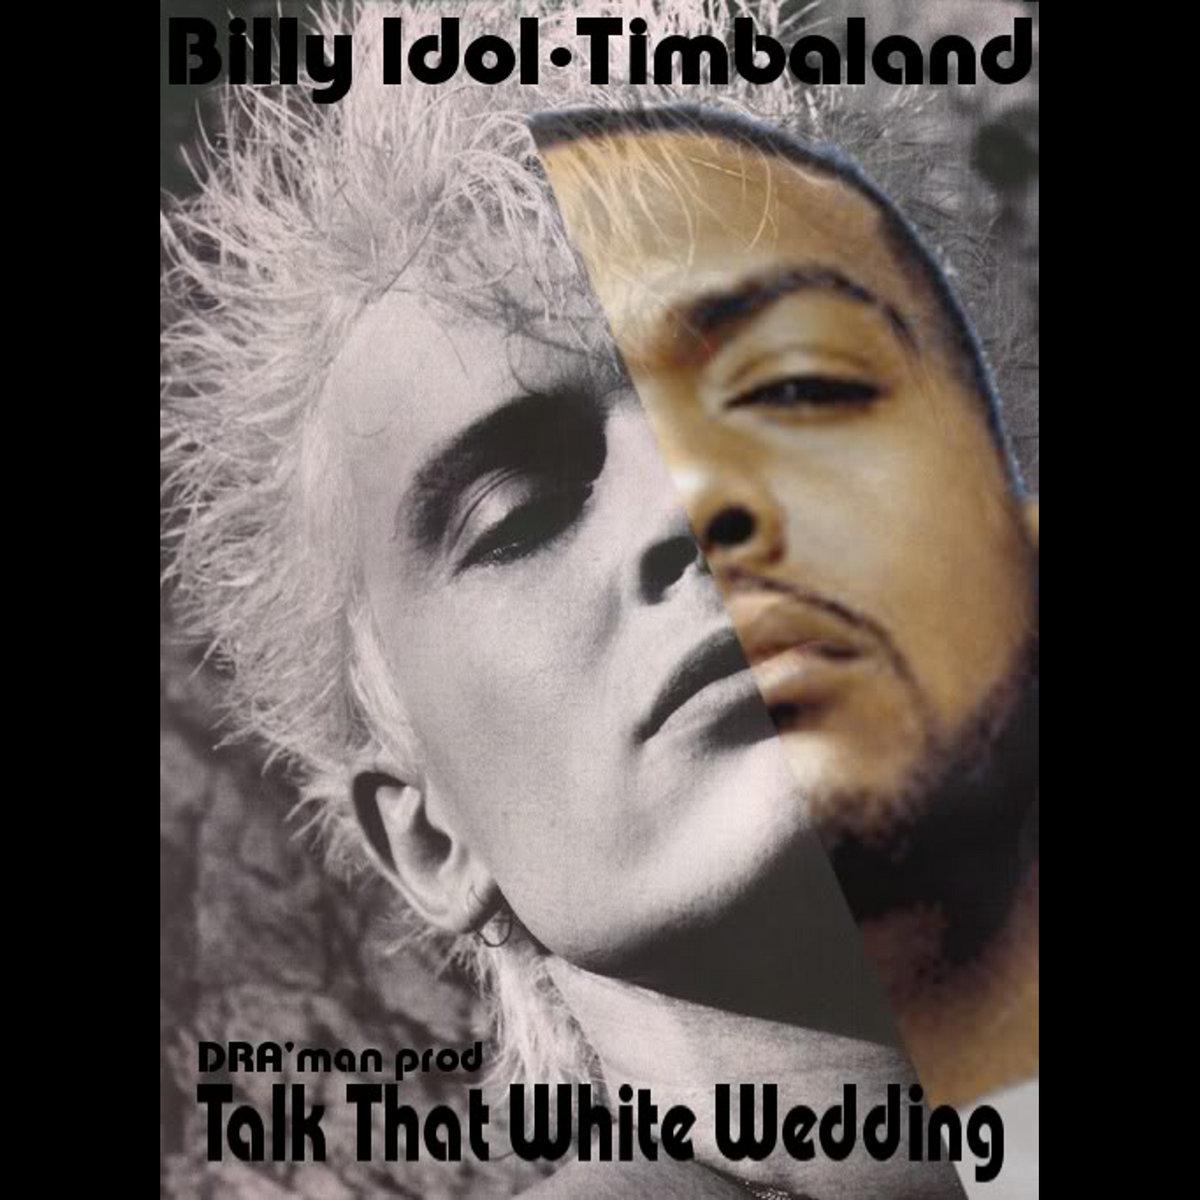 White Wedding Billy Idol.Dra Man Talk That White Wedding Billy Idol Vs Timbaland